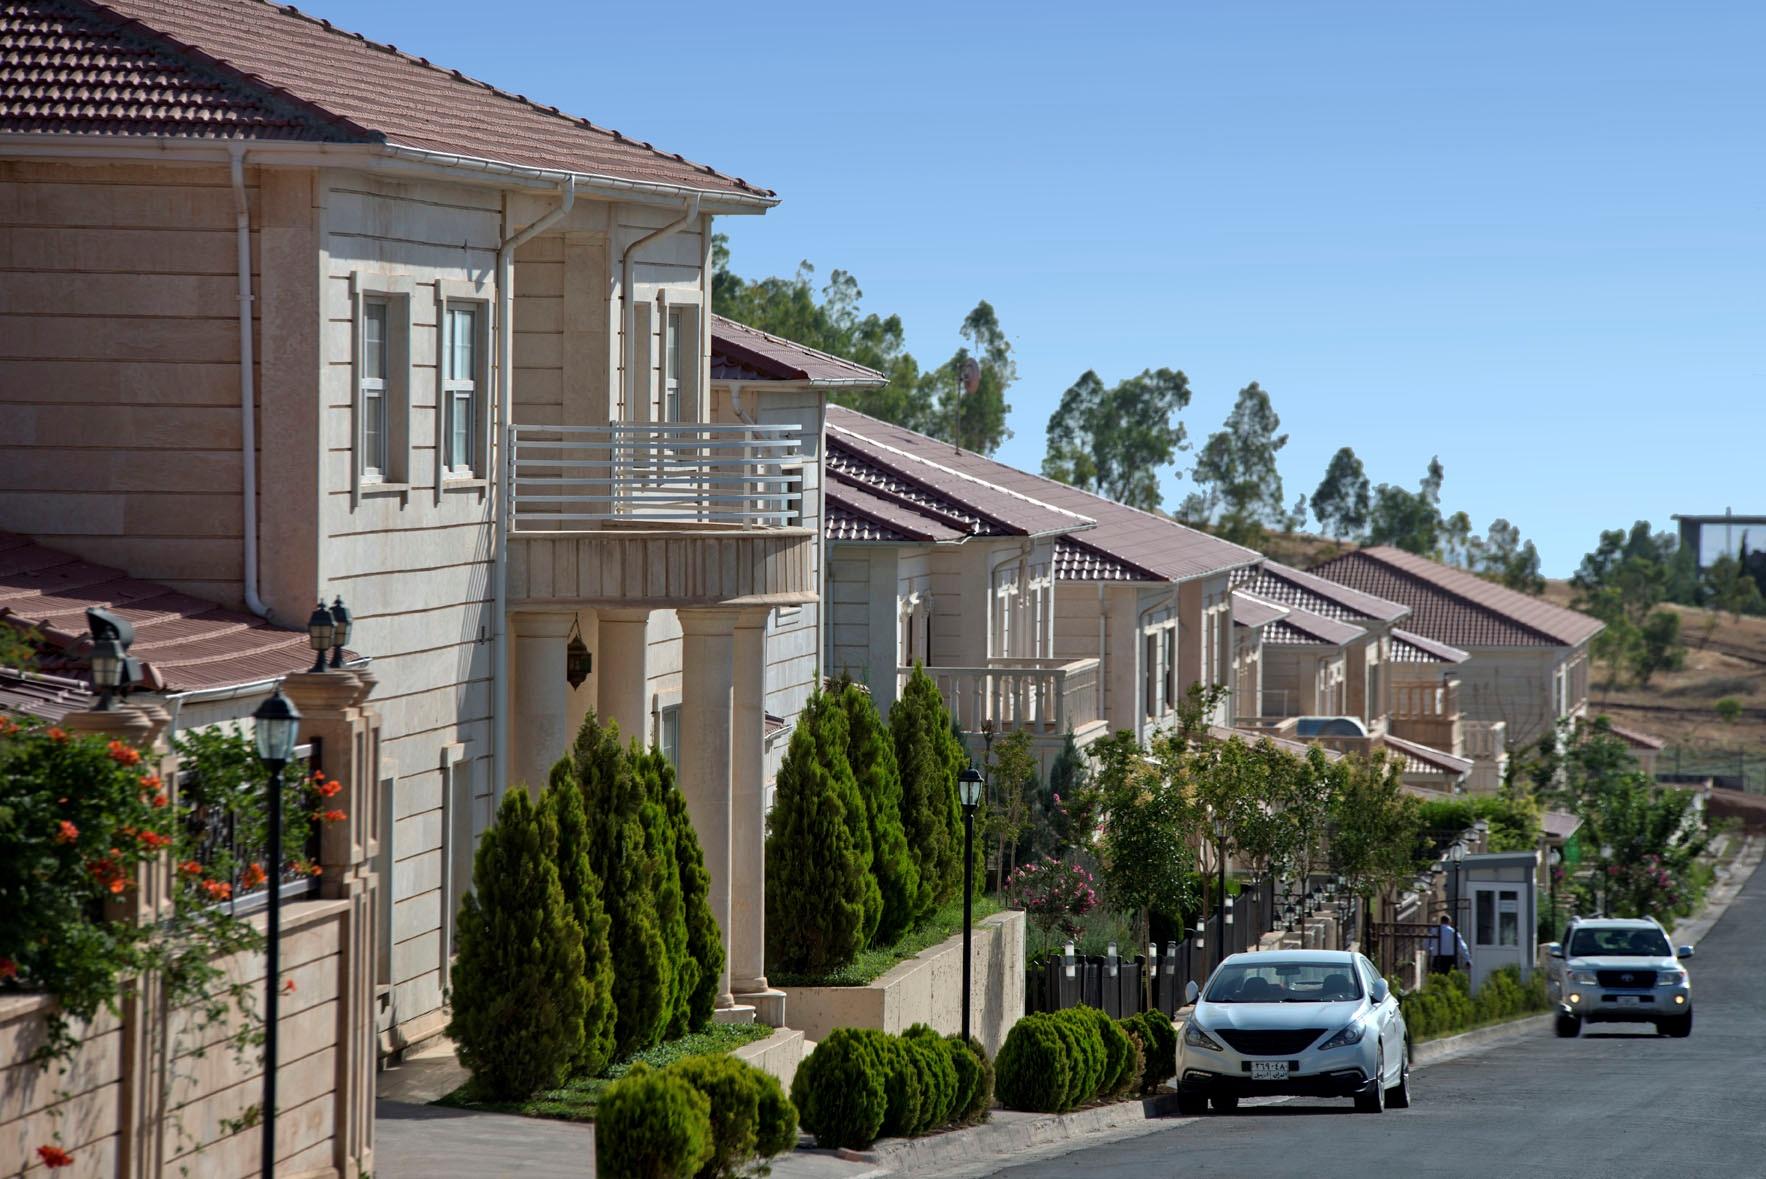 16 America U0027s Most Beautiful Houses 100